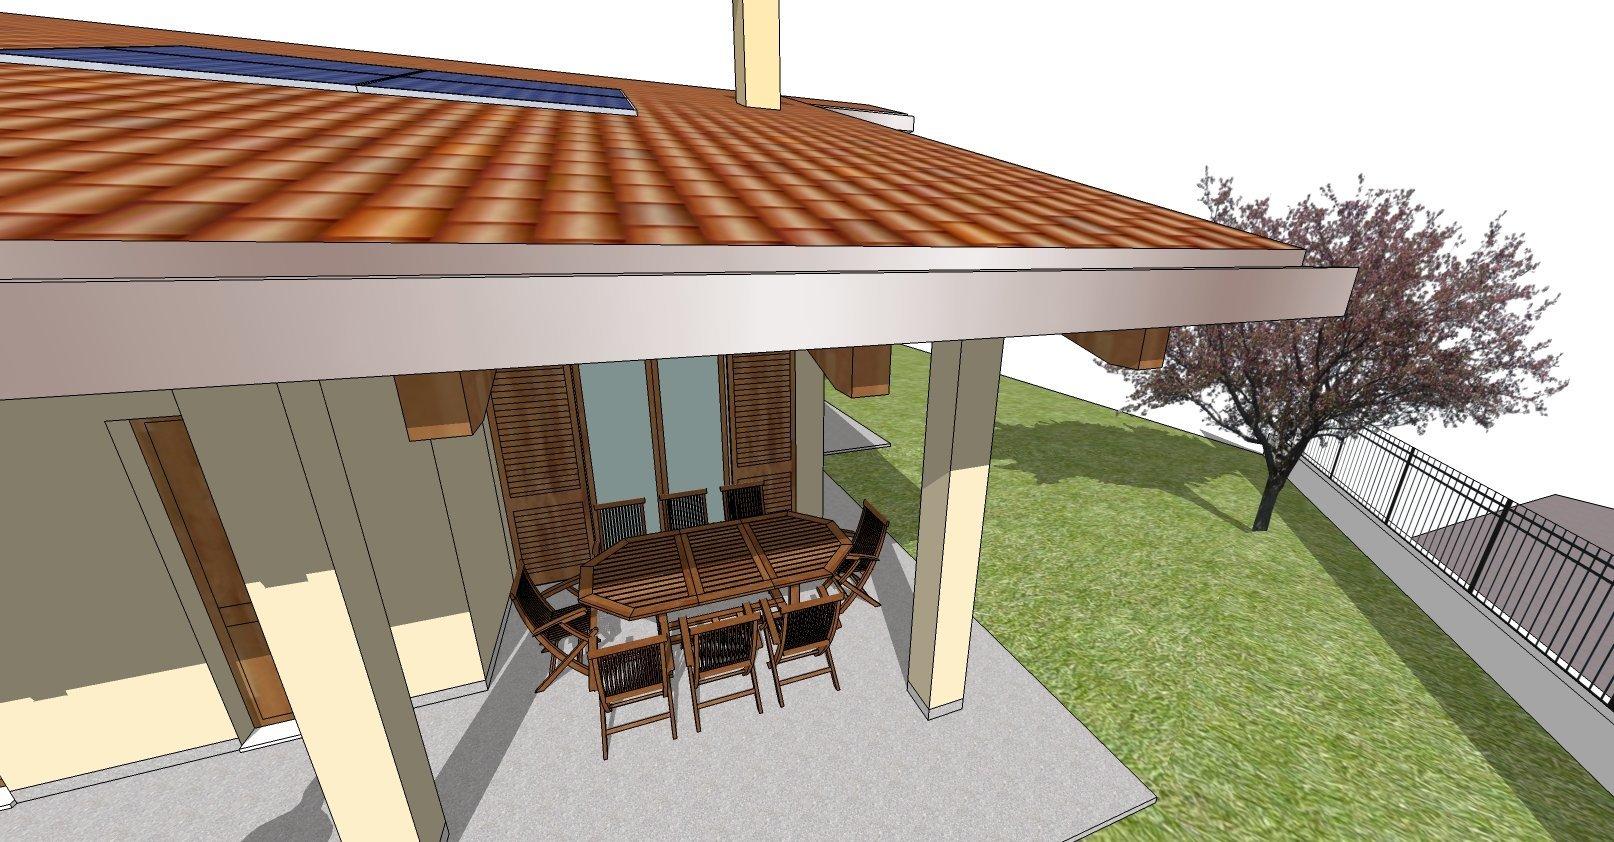 disegno bozza casa - gazebo